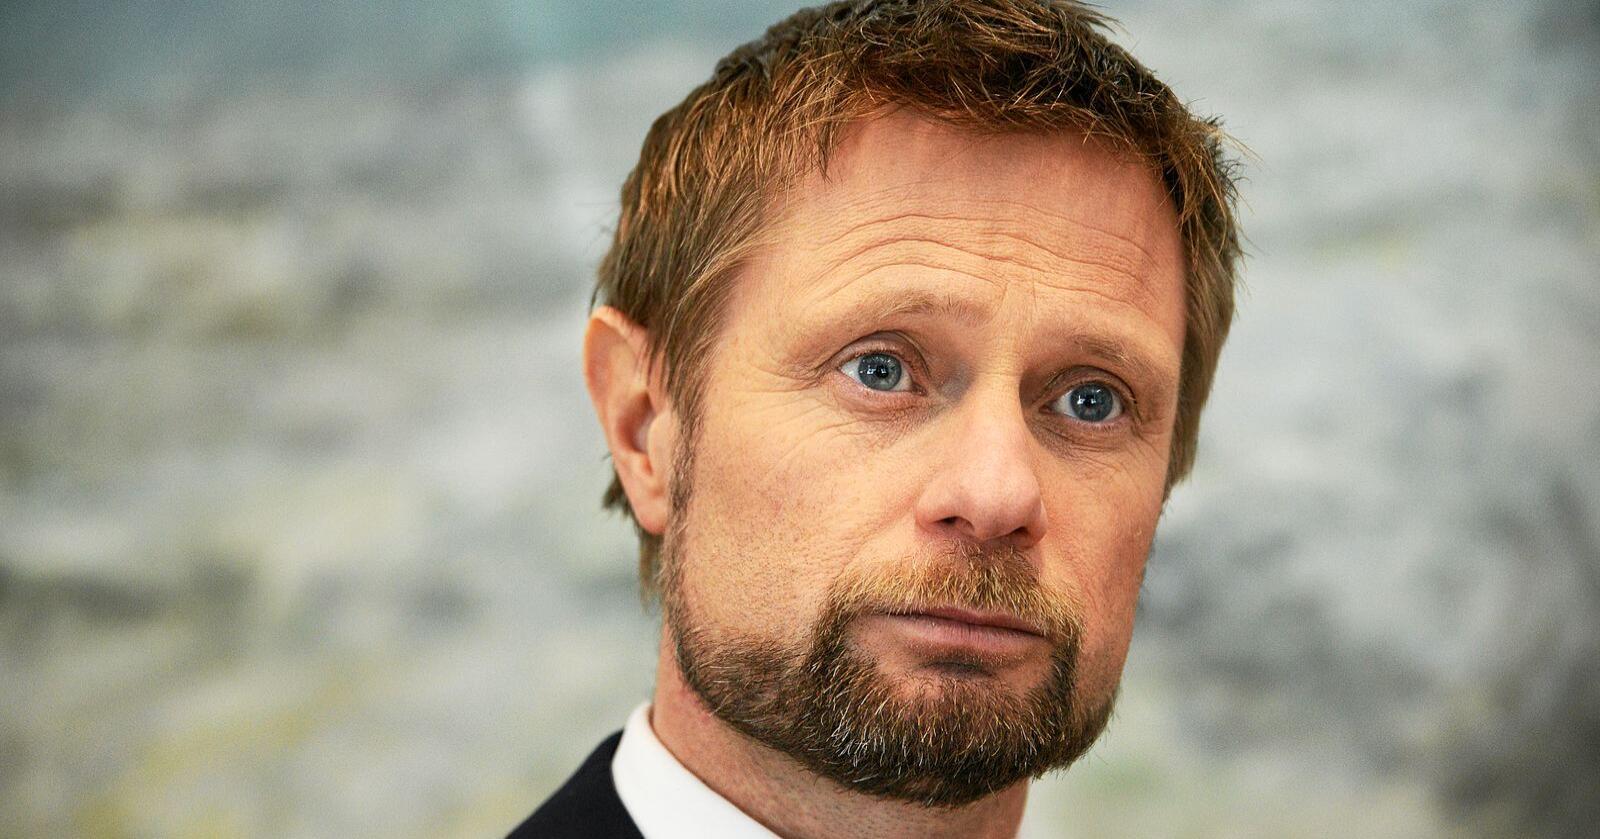 Helseminister Bent Høie (H). Foto: Siri Juell Rasmussen